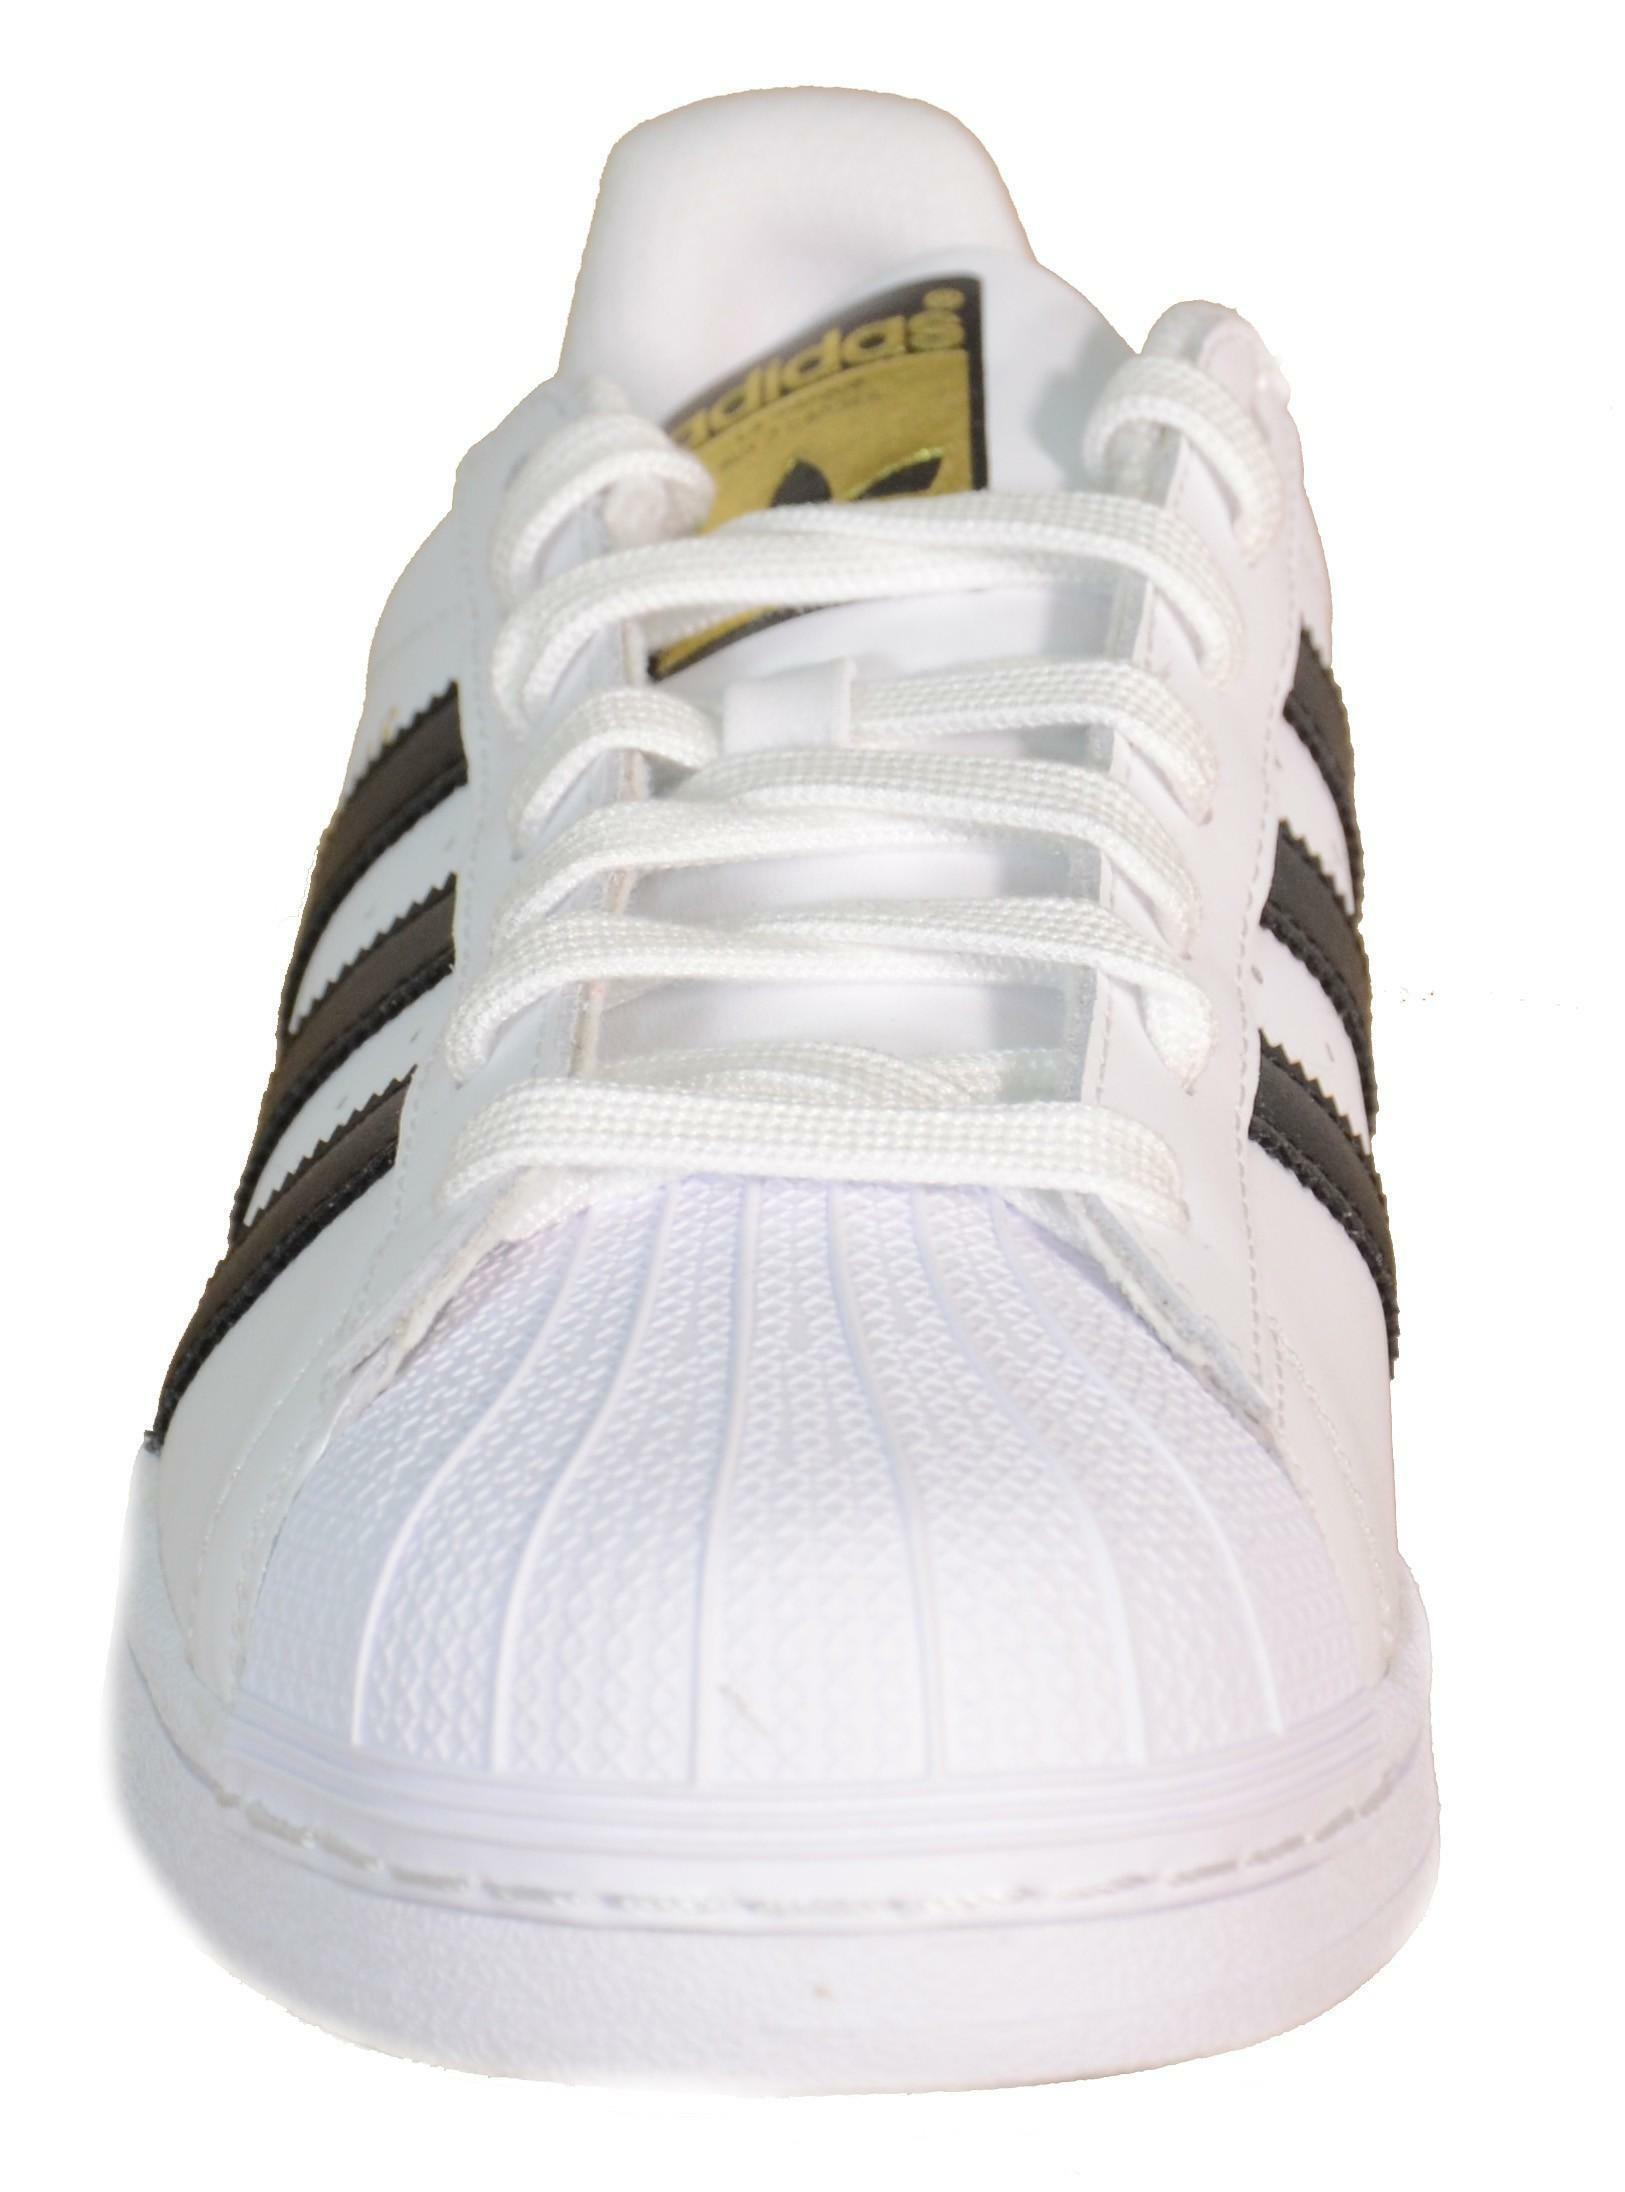 adidas adidas superstar j scarpe bianche pelle c77154